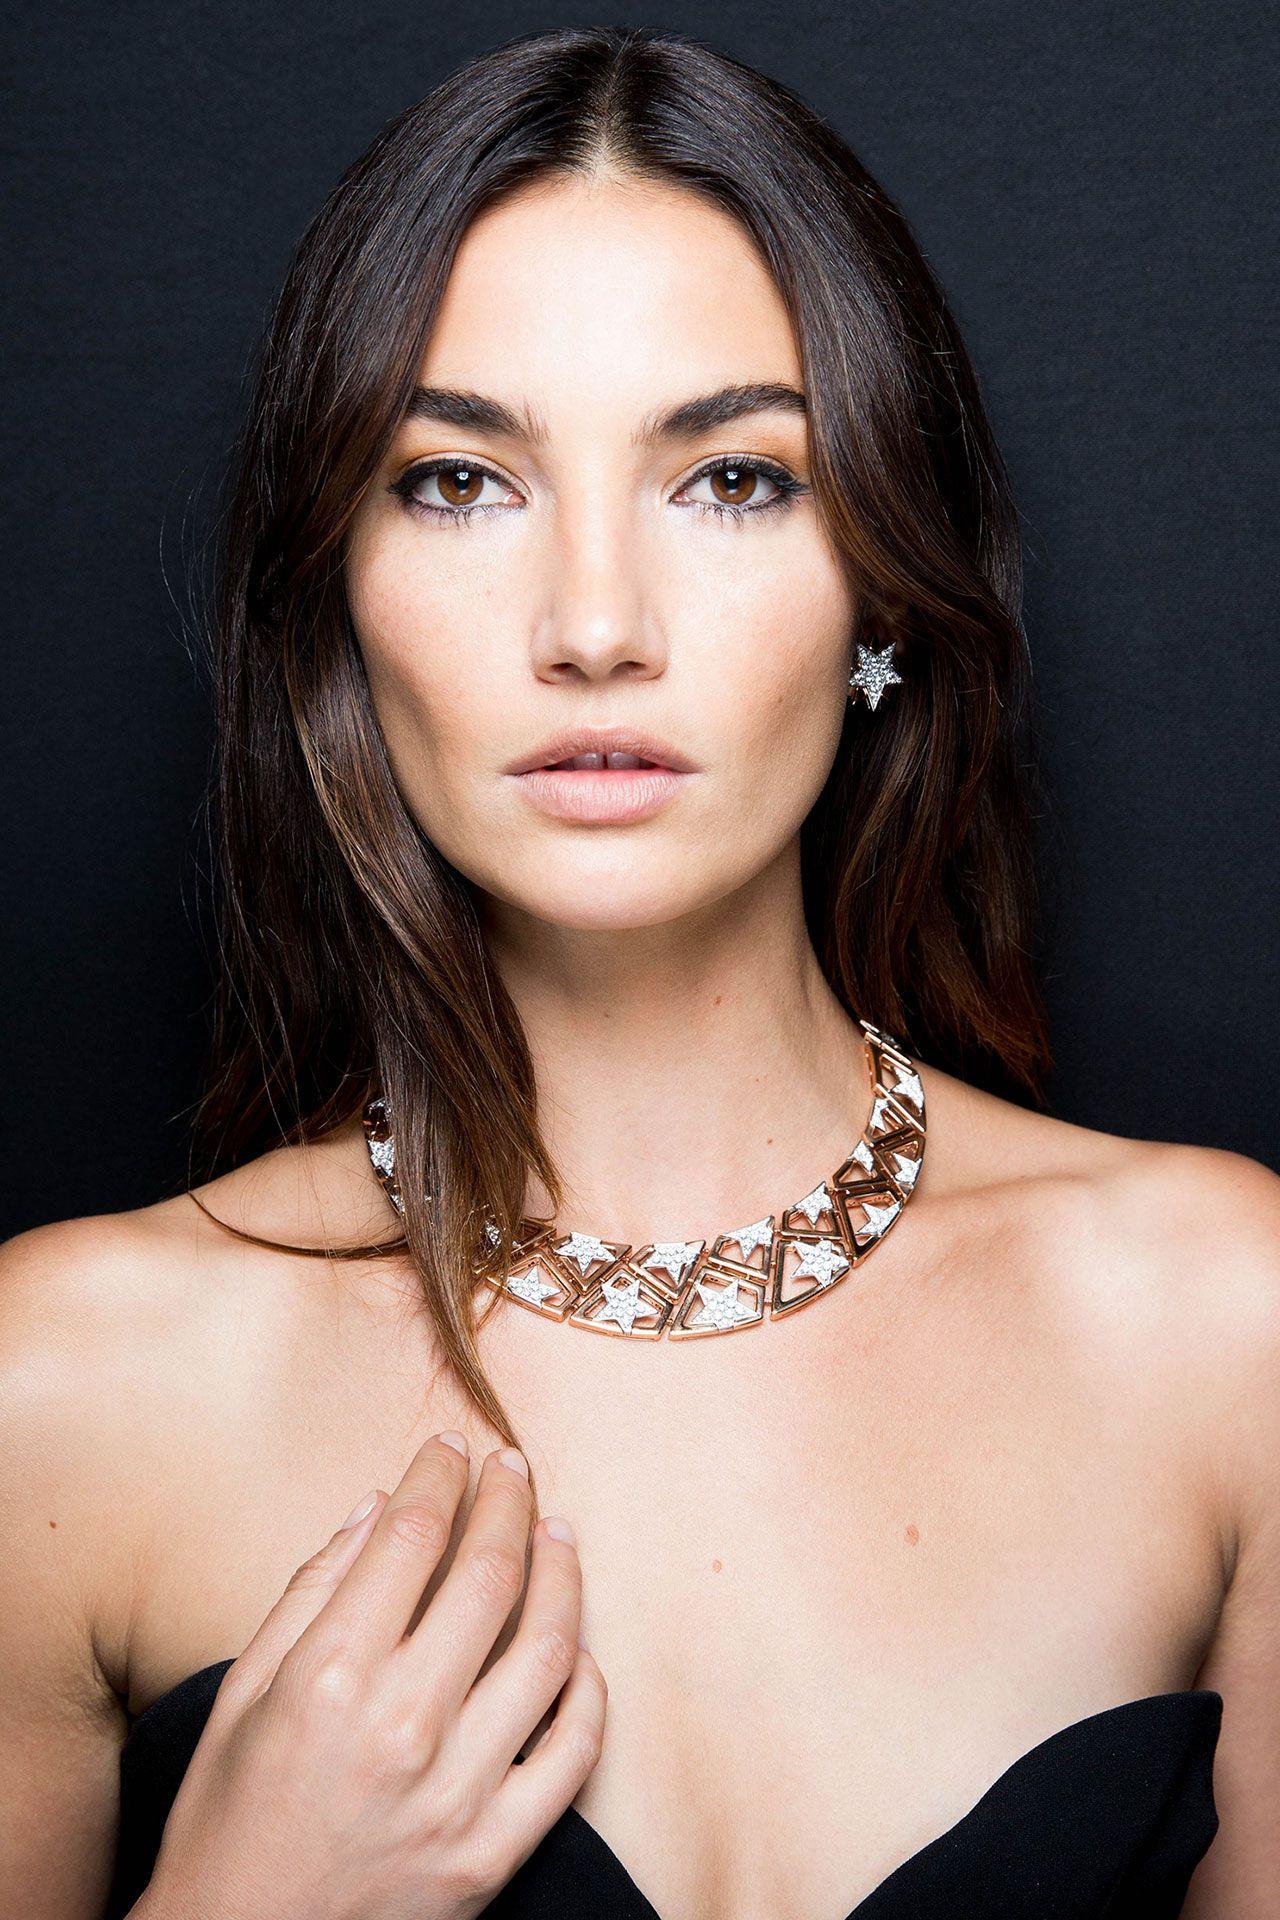 Lily Aldridge in Bulgari NY Capsule Collection High Jewelry   Bvlgari, Bulgari high jewelry, High jewelry